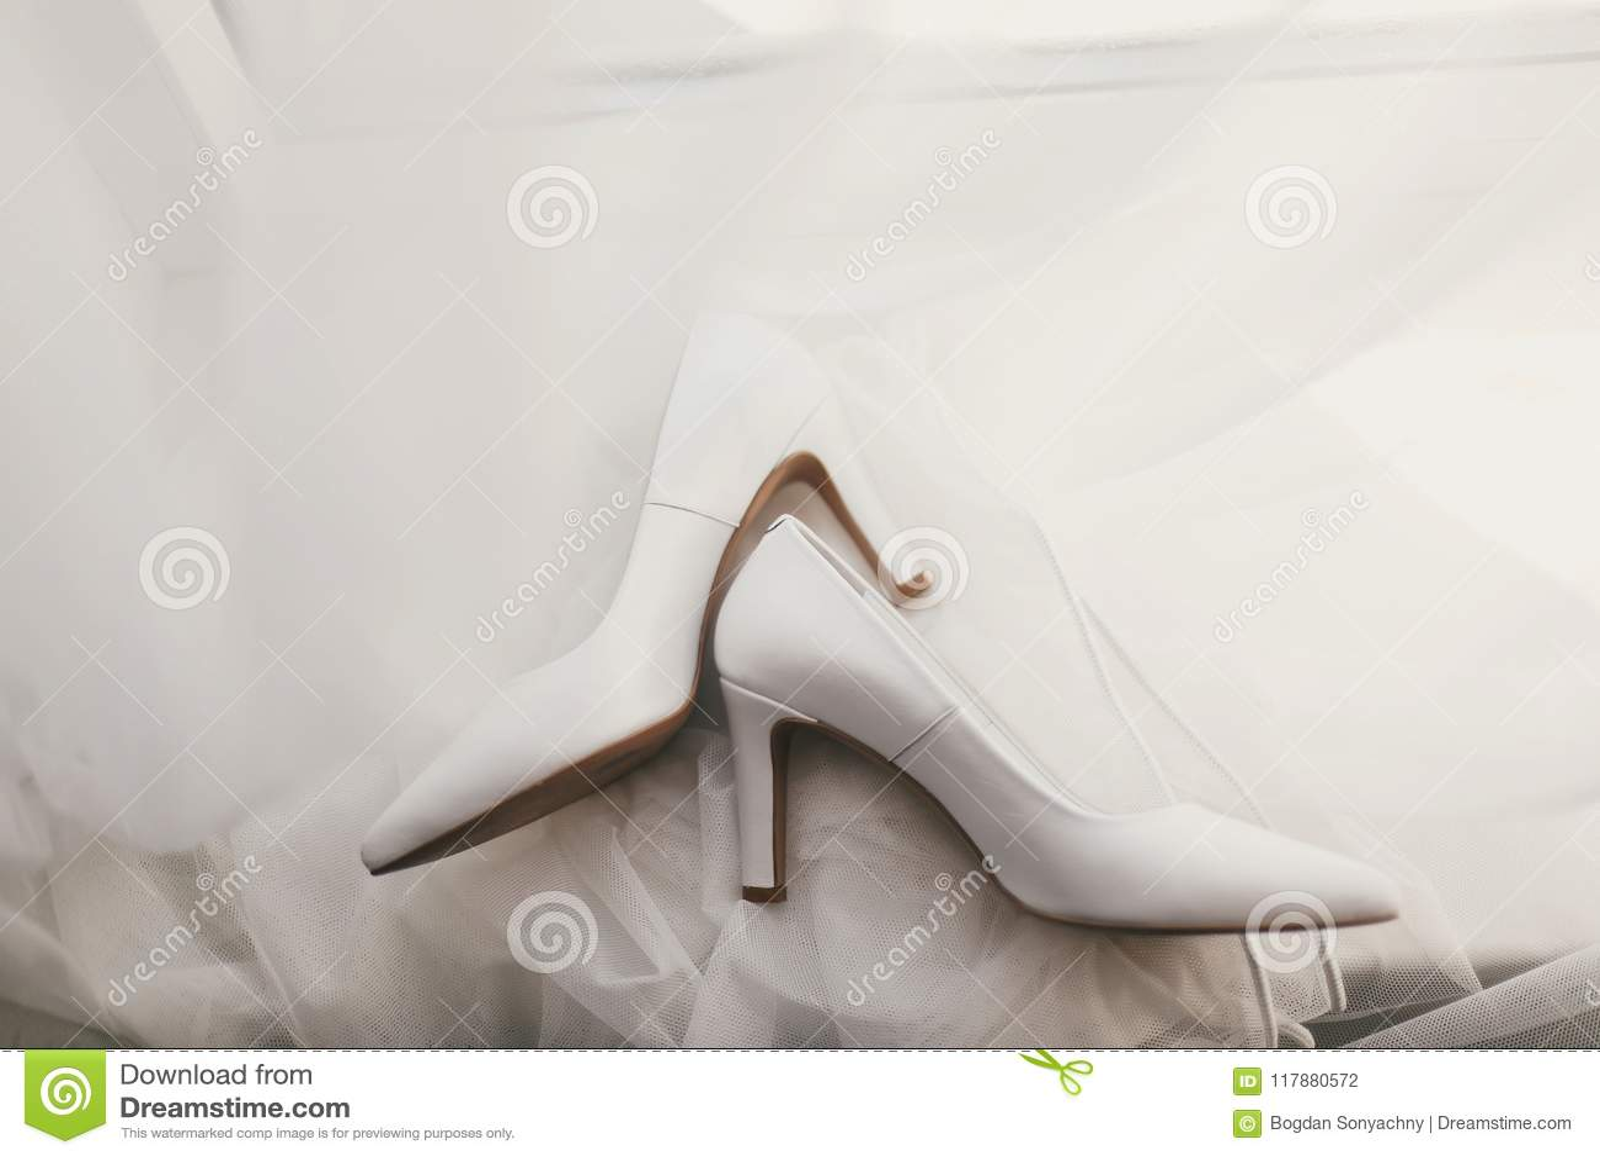 a65f53b58a27 Beautiful Stylish Shoes On Luxury Silk Wedding Dress